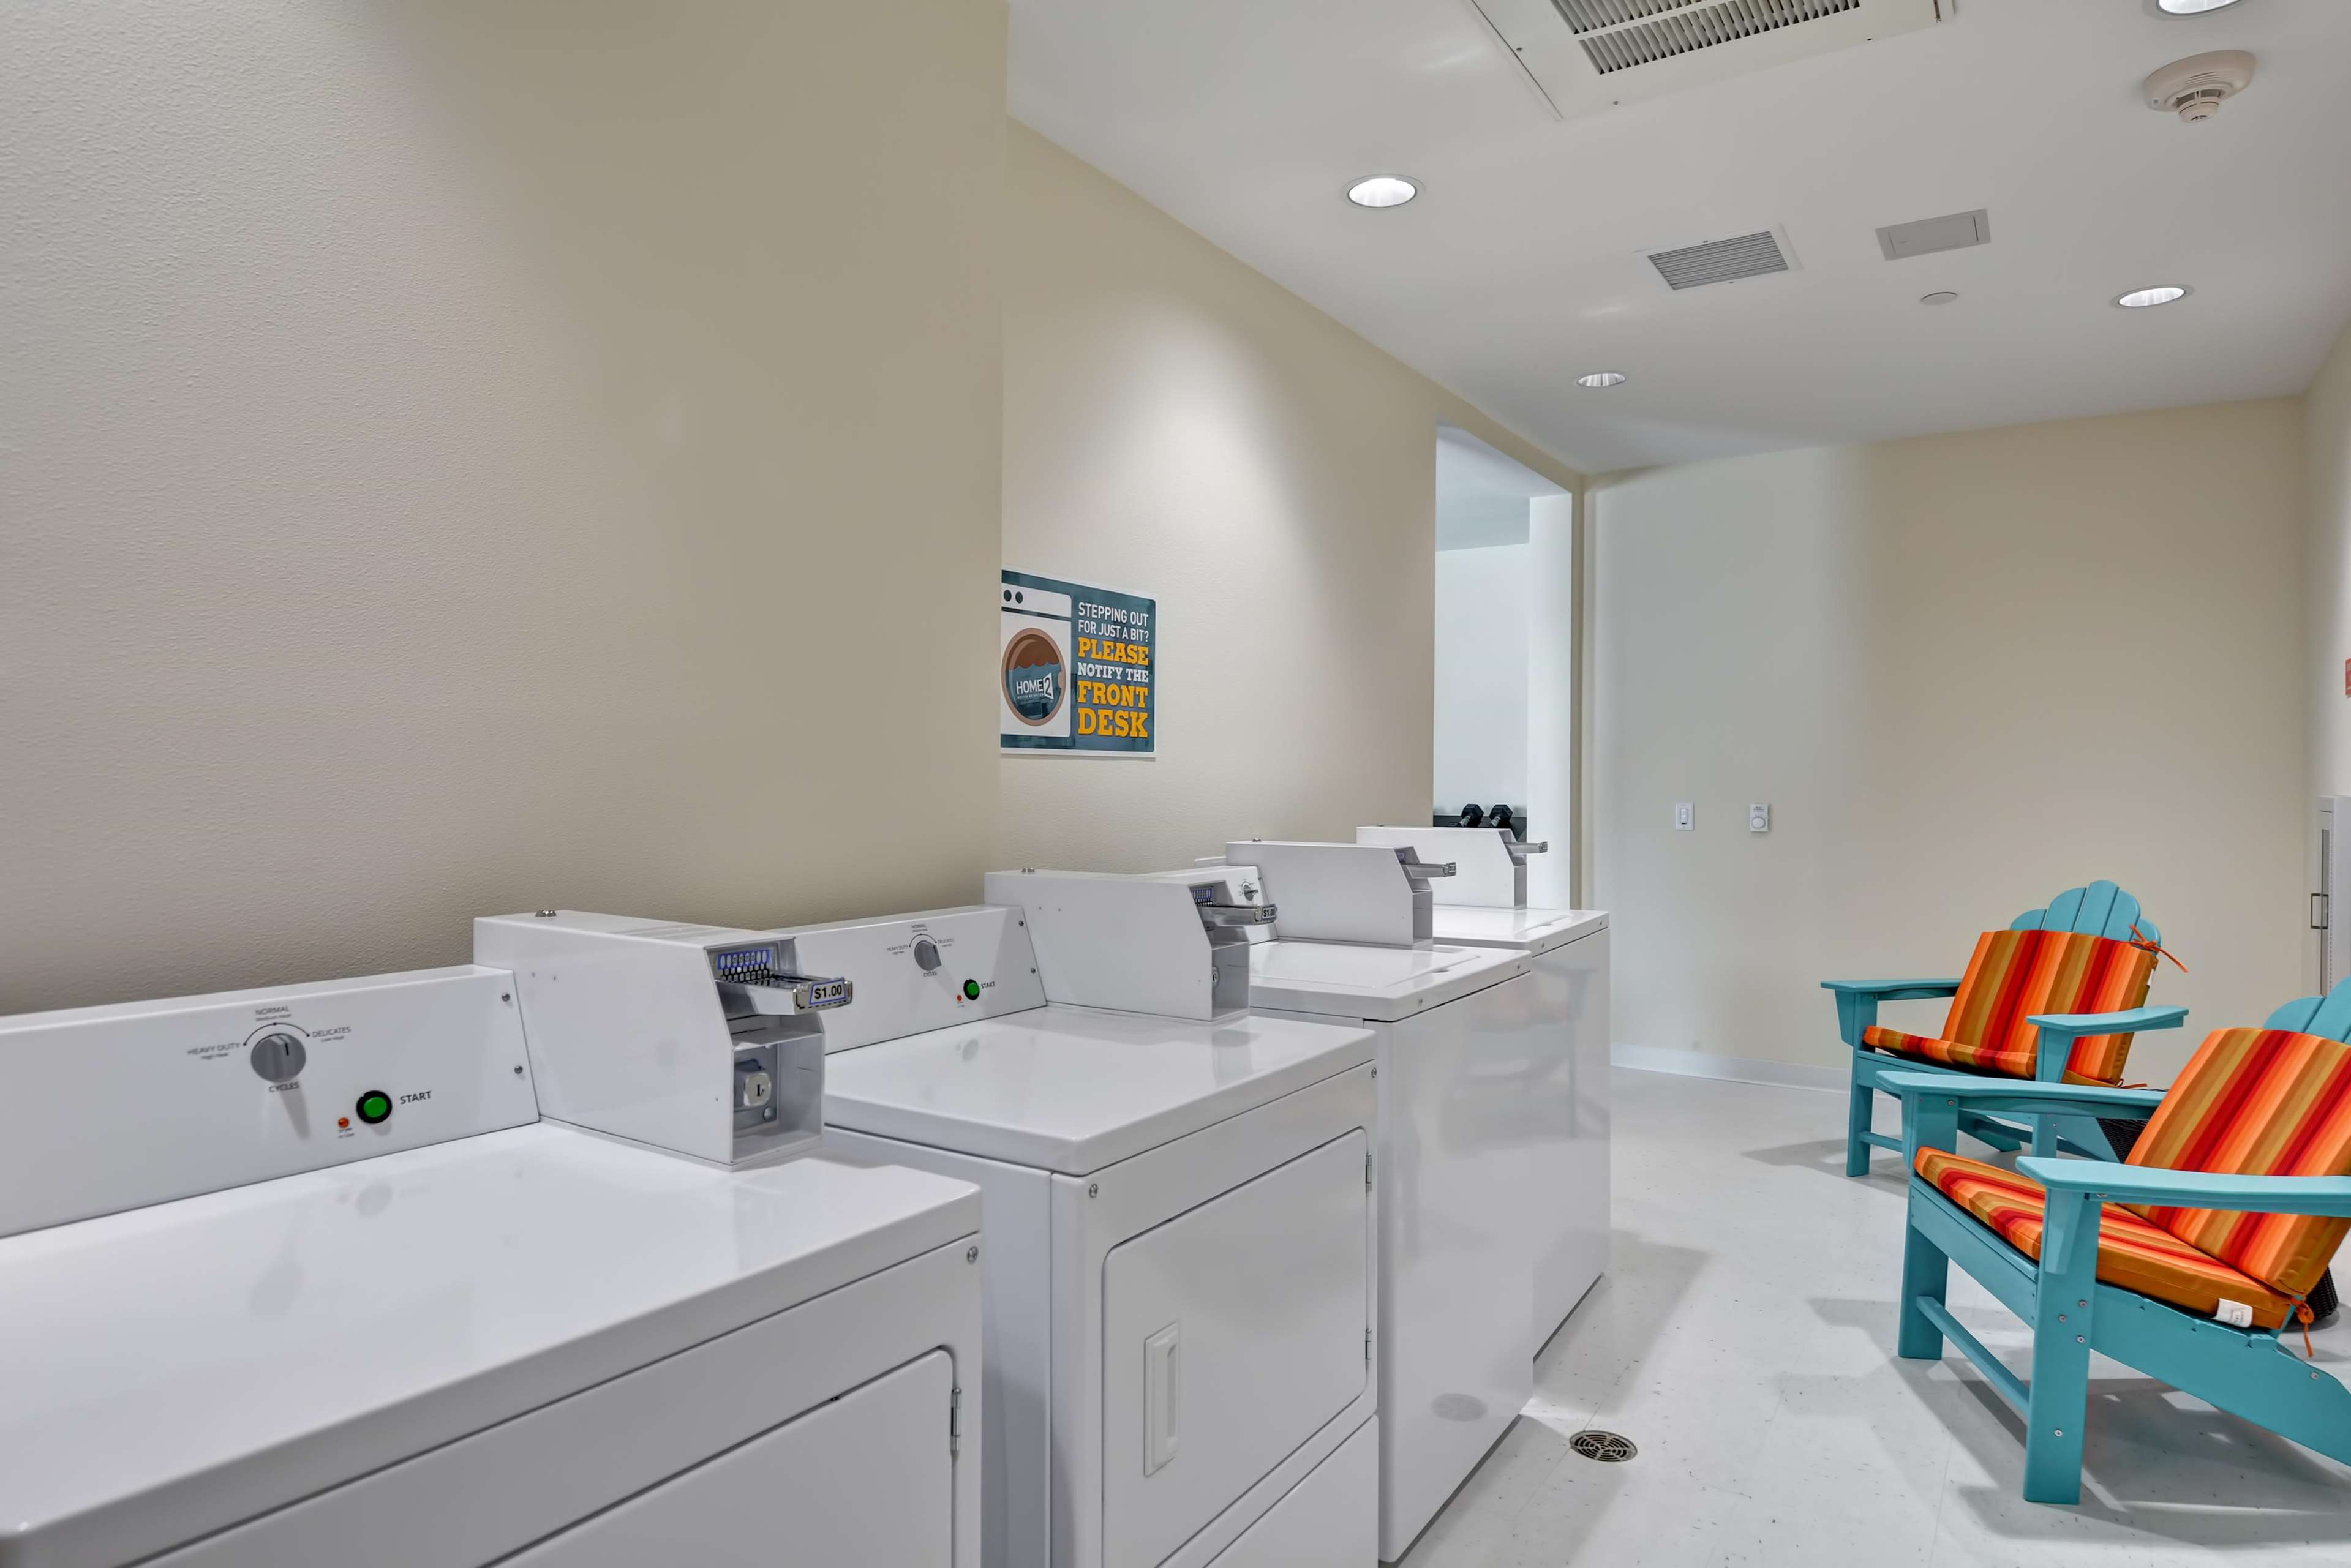 Home2 Suites by Hilton Azusa image 24